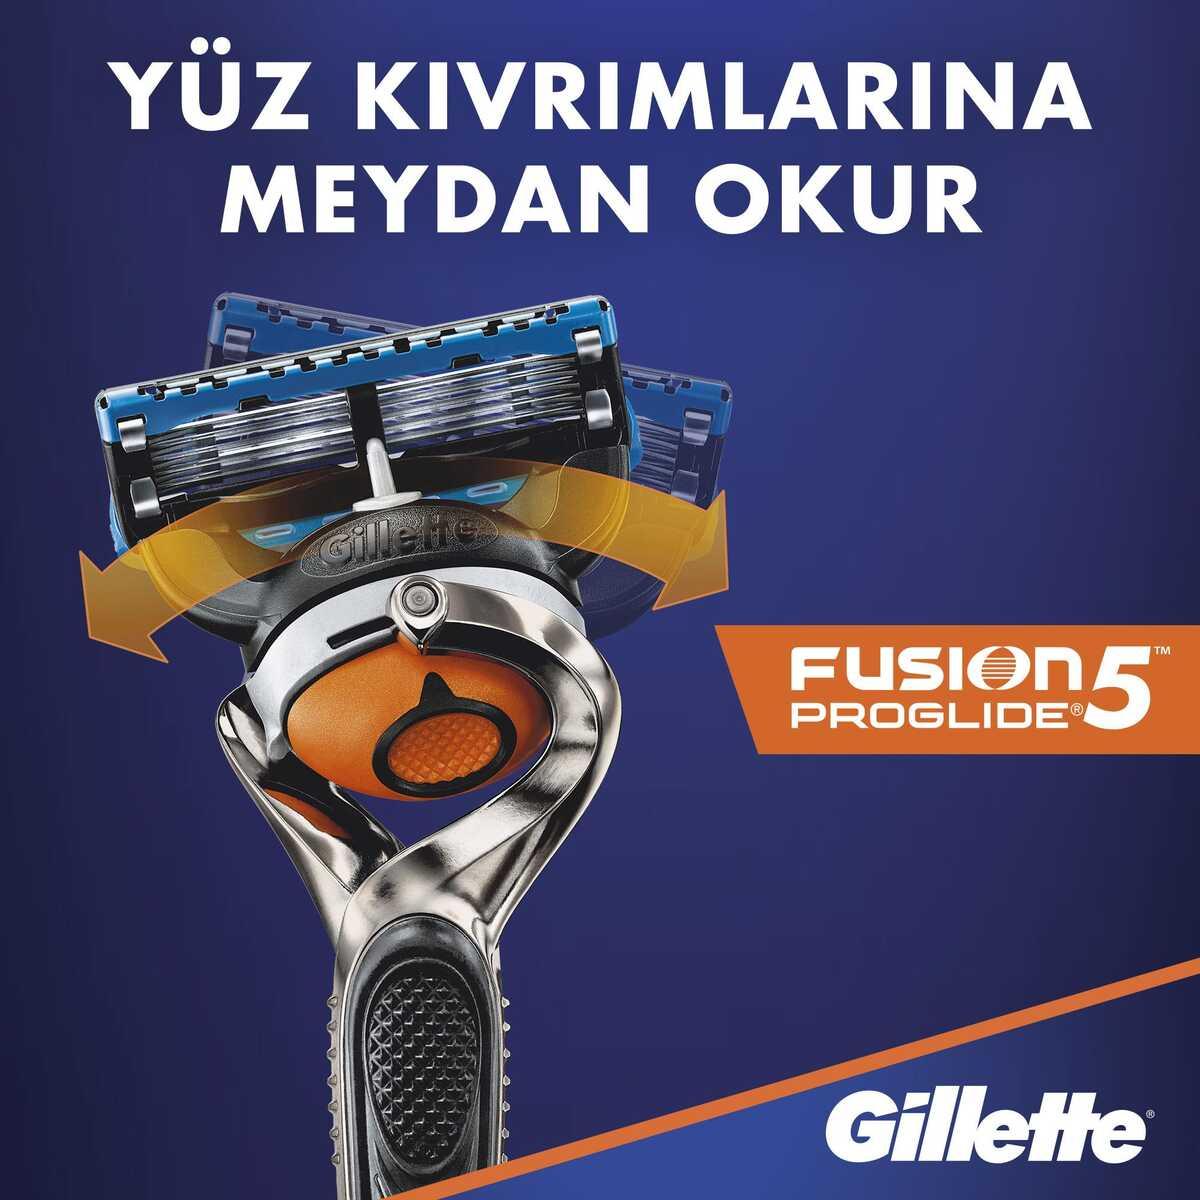 Fusion Proglide Power 4'lü Bıçak